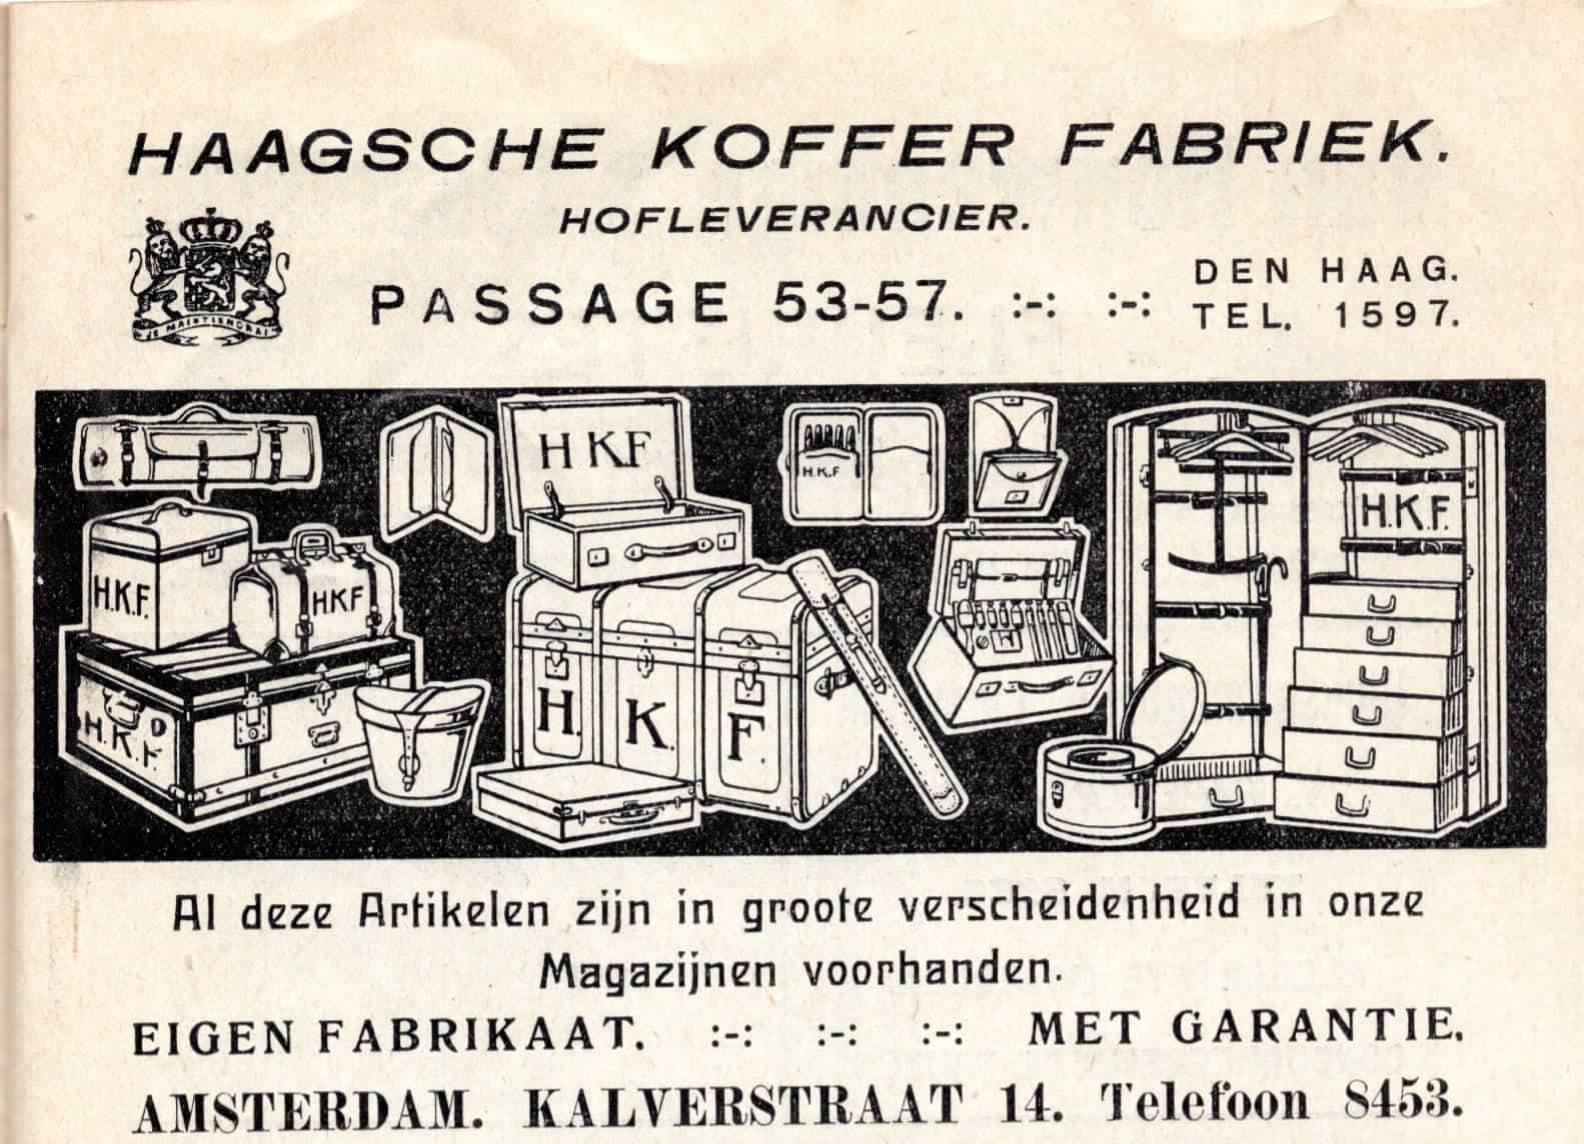 Reclame Haagsche Kofferfabriek, 1915